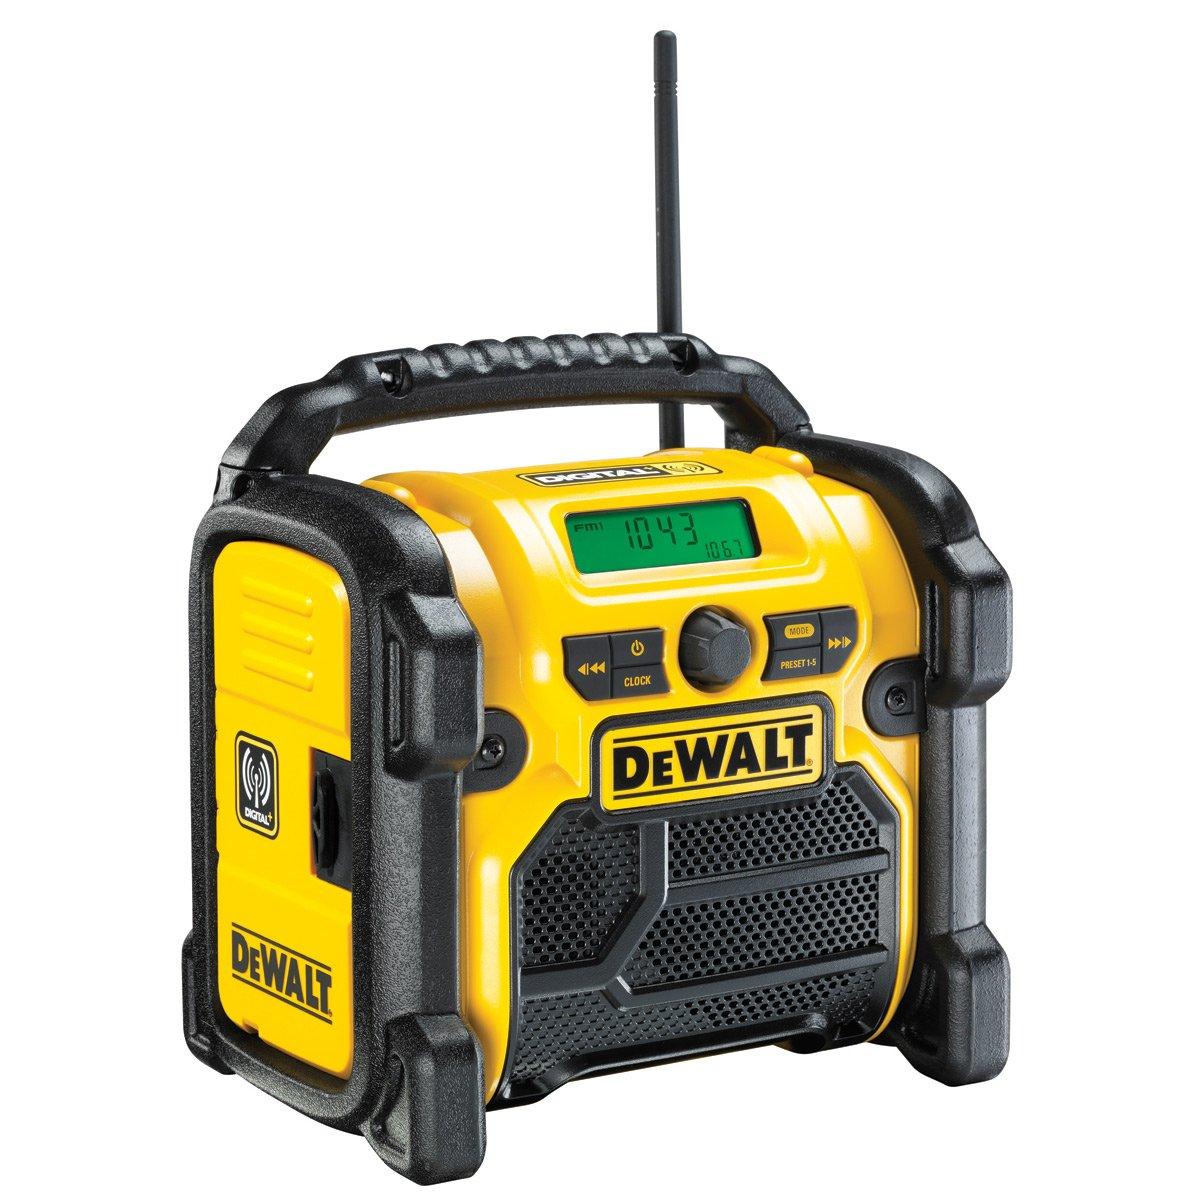 DeWalt DCR020-GB Compacto Jobsite Dab Radio